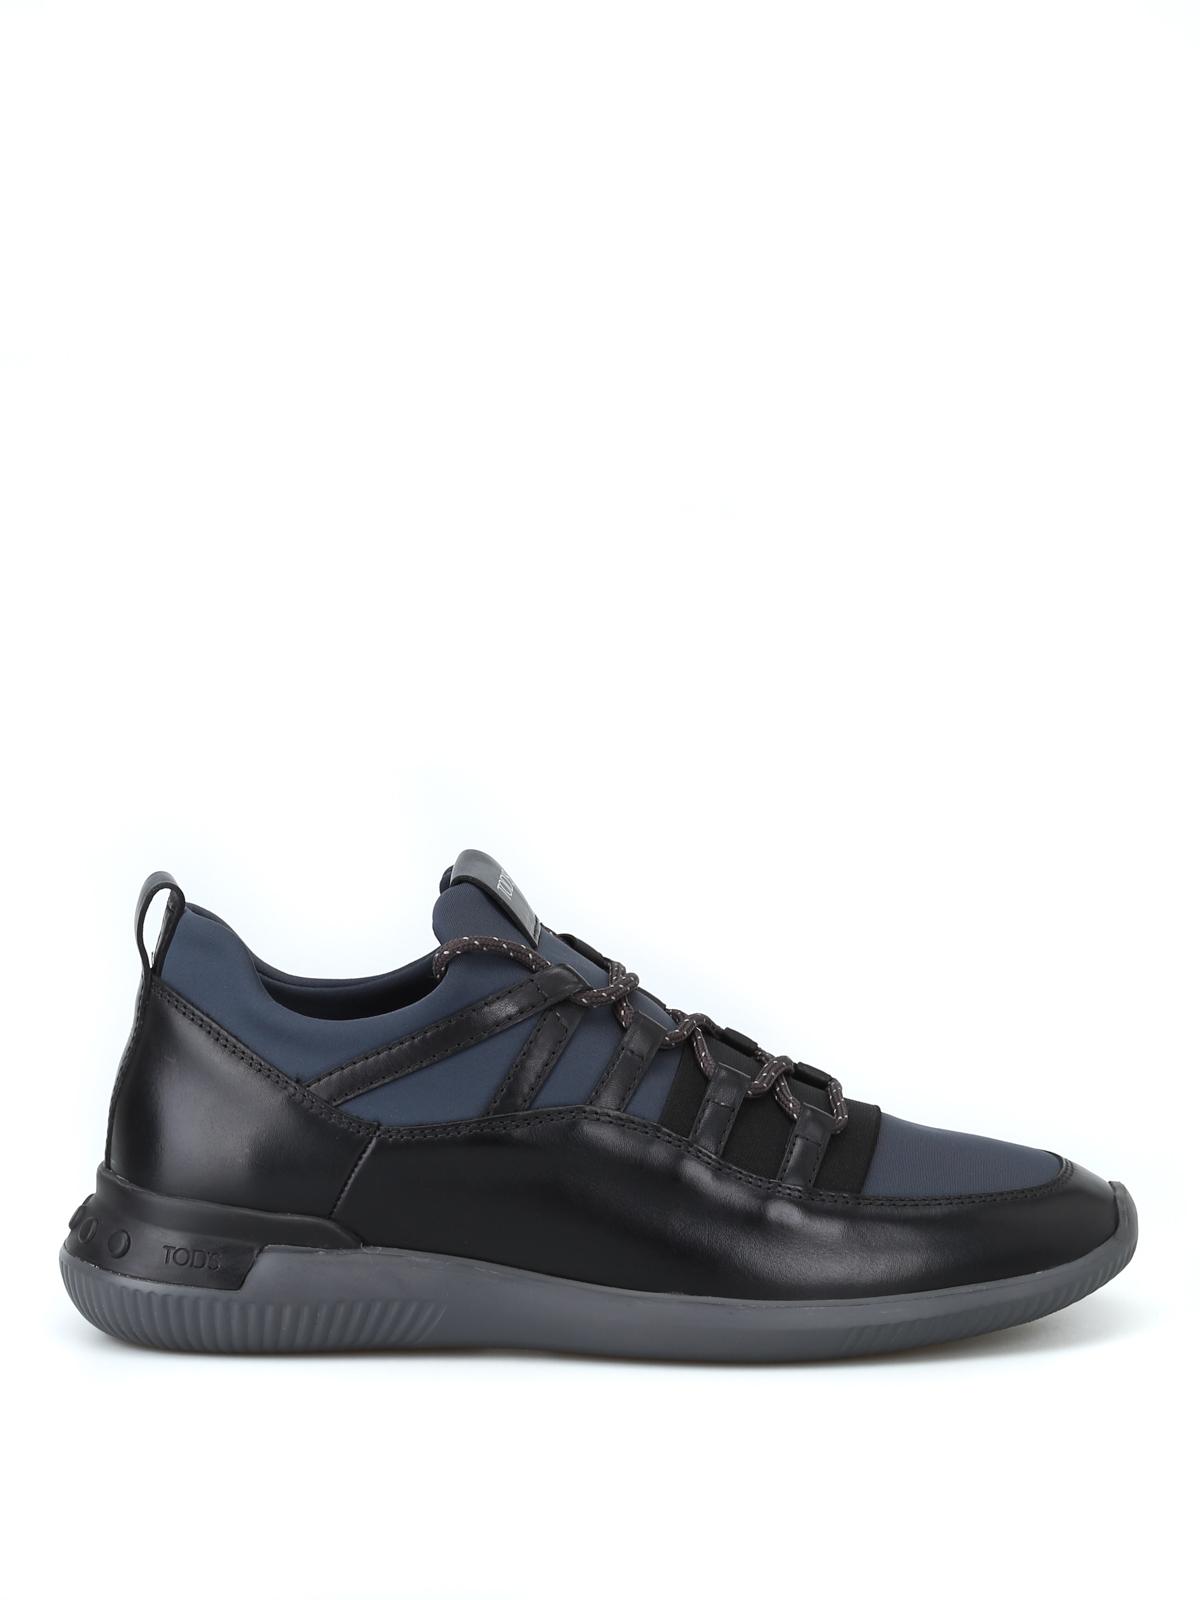 57f49e0fcddb83 No-Code sneakers in leather and scuba-effect fabric - TOD S - Paolo Fiorillo